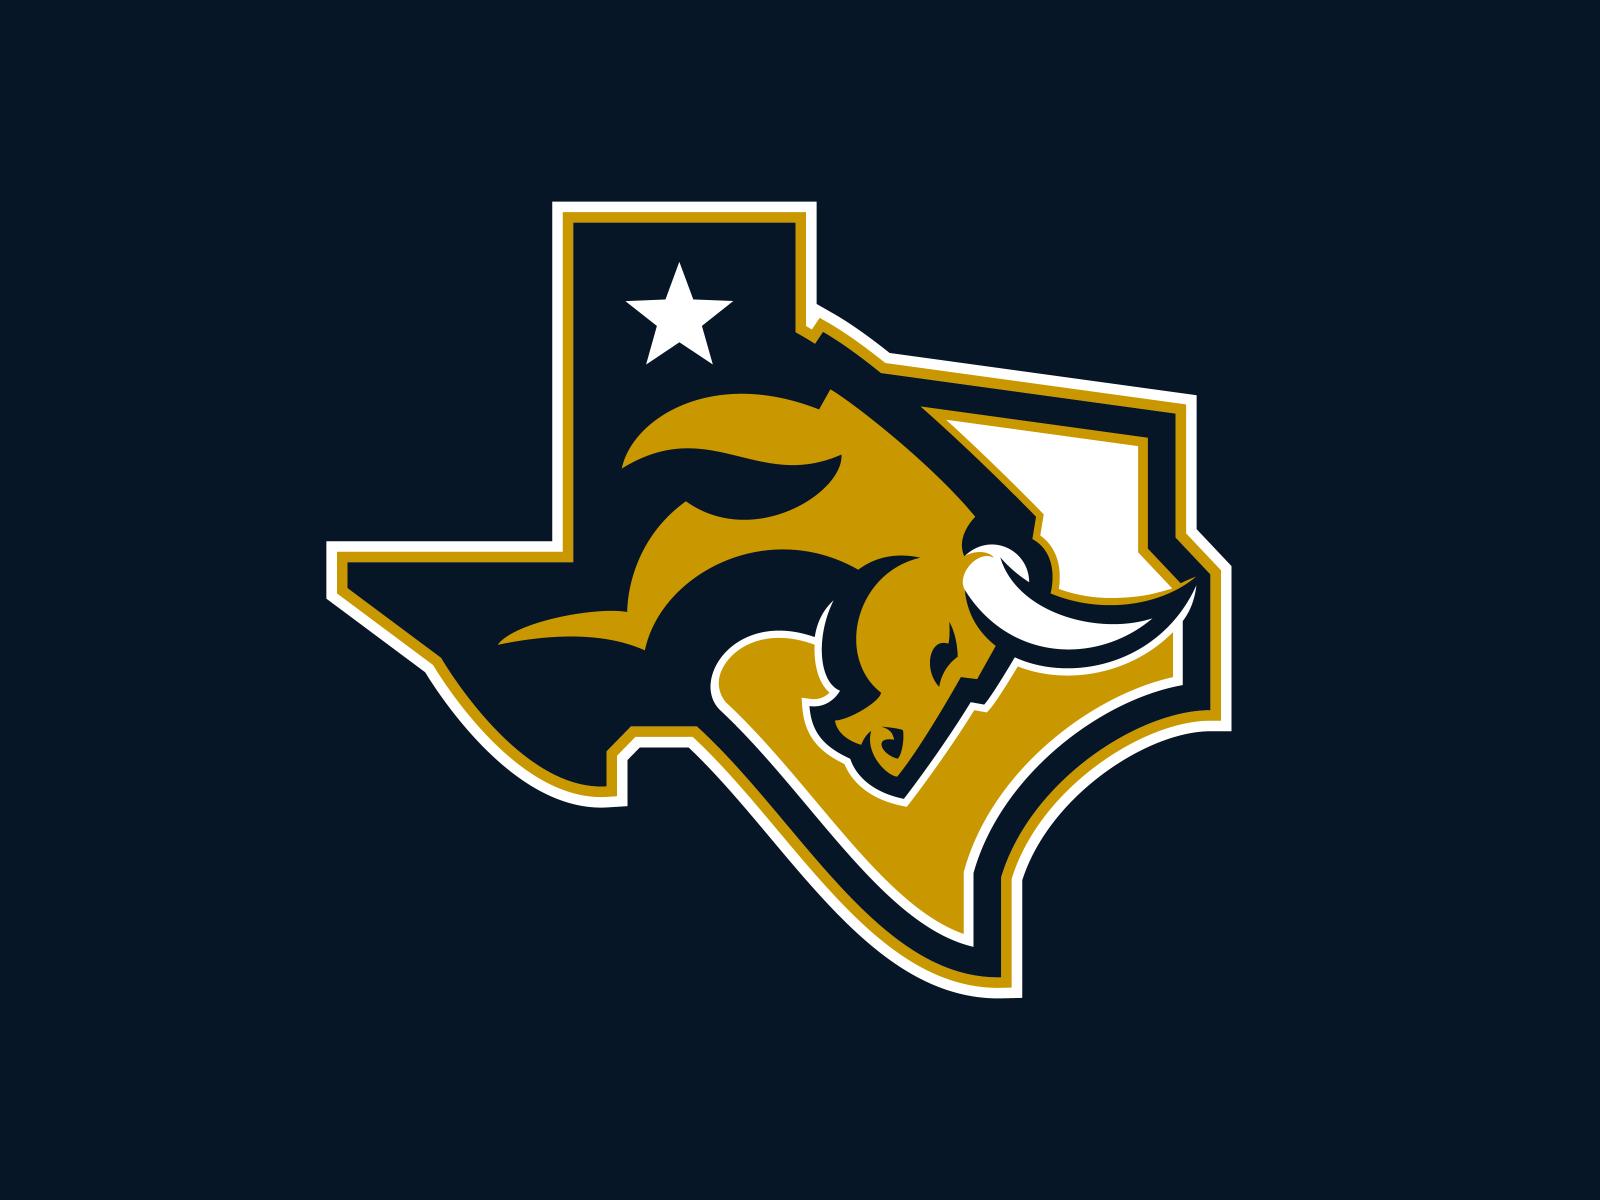 Badgers In 2020 Football Logo Design Logos Mascot